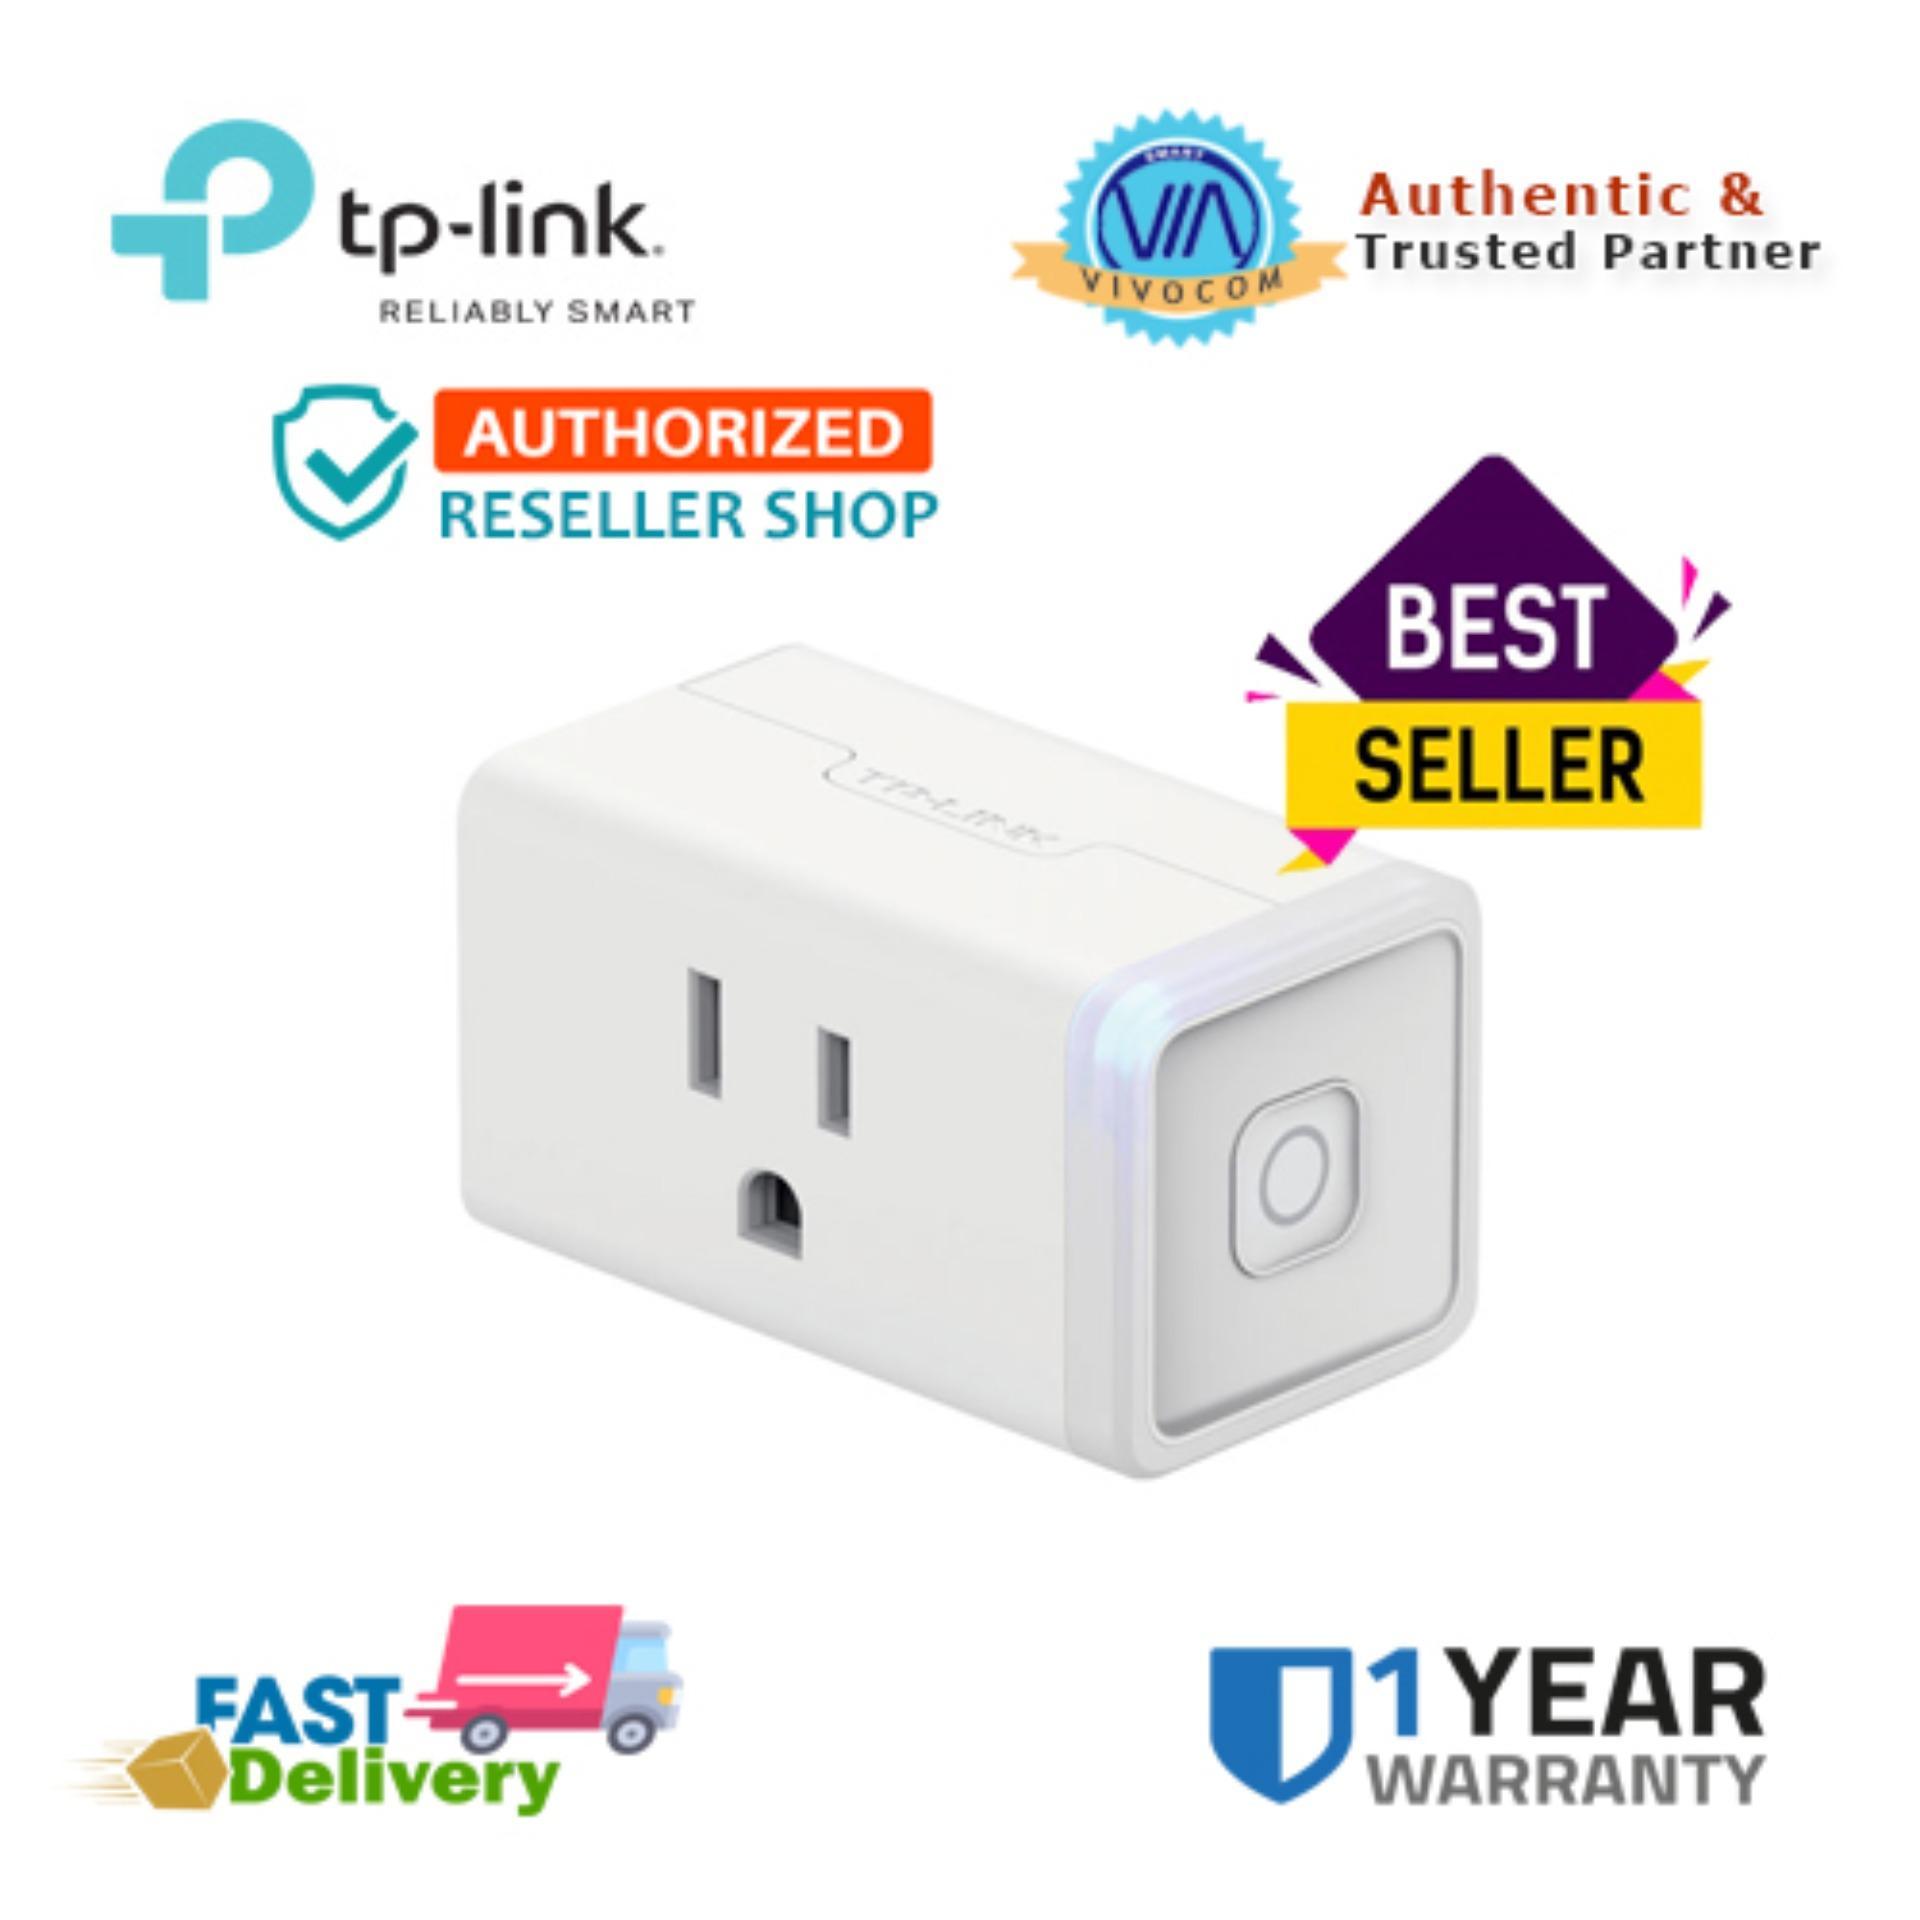 Tp-Link Hs105 Smart Wi-Fi Plug Mini By Vivocom Technologies Inc